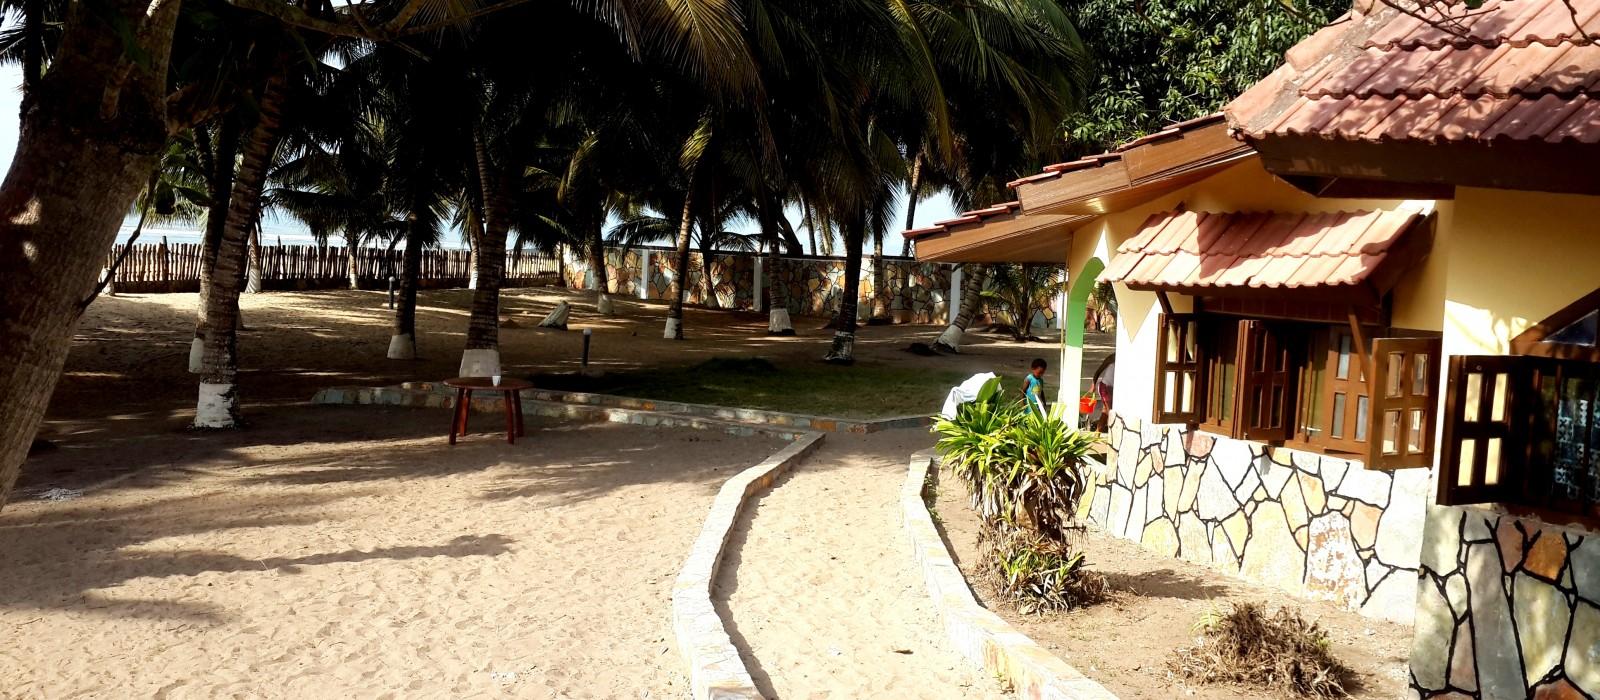 Beach house - side view